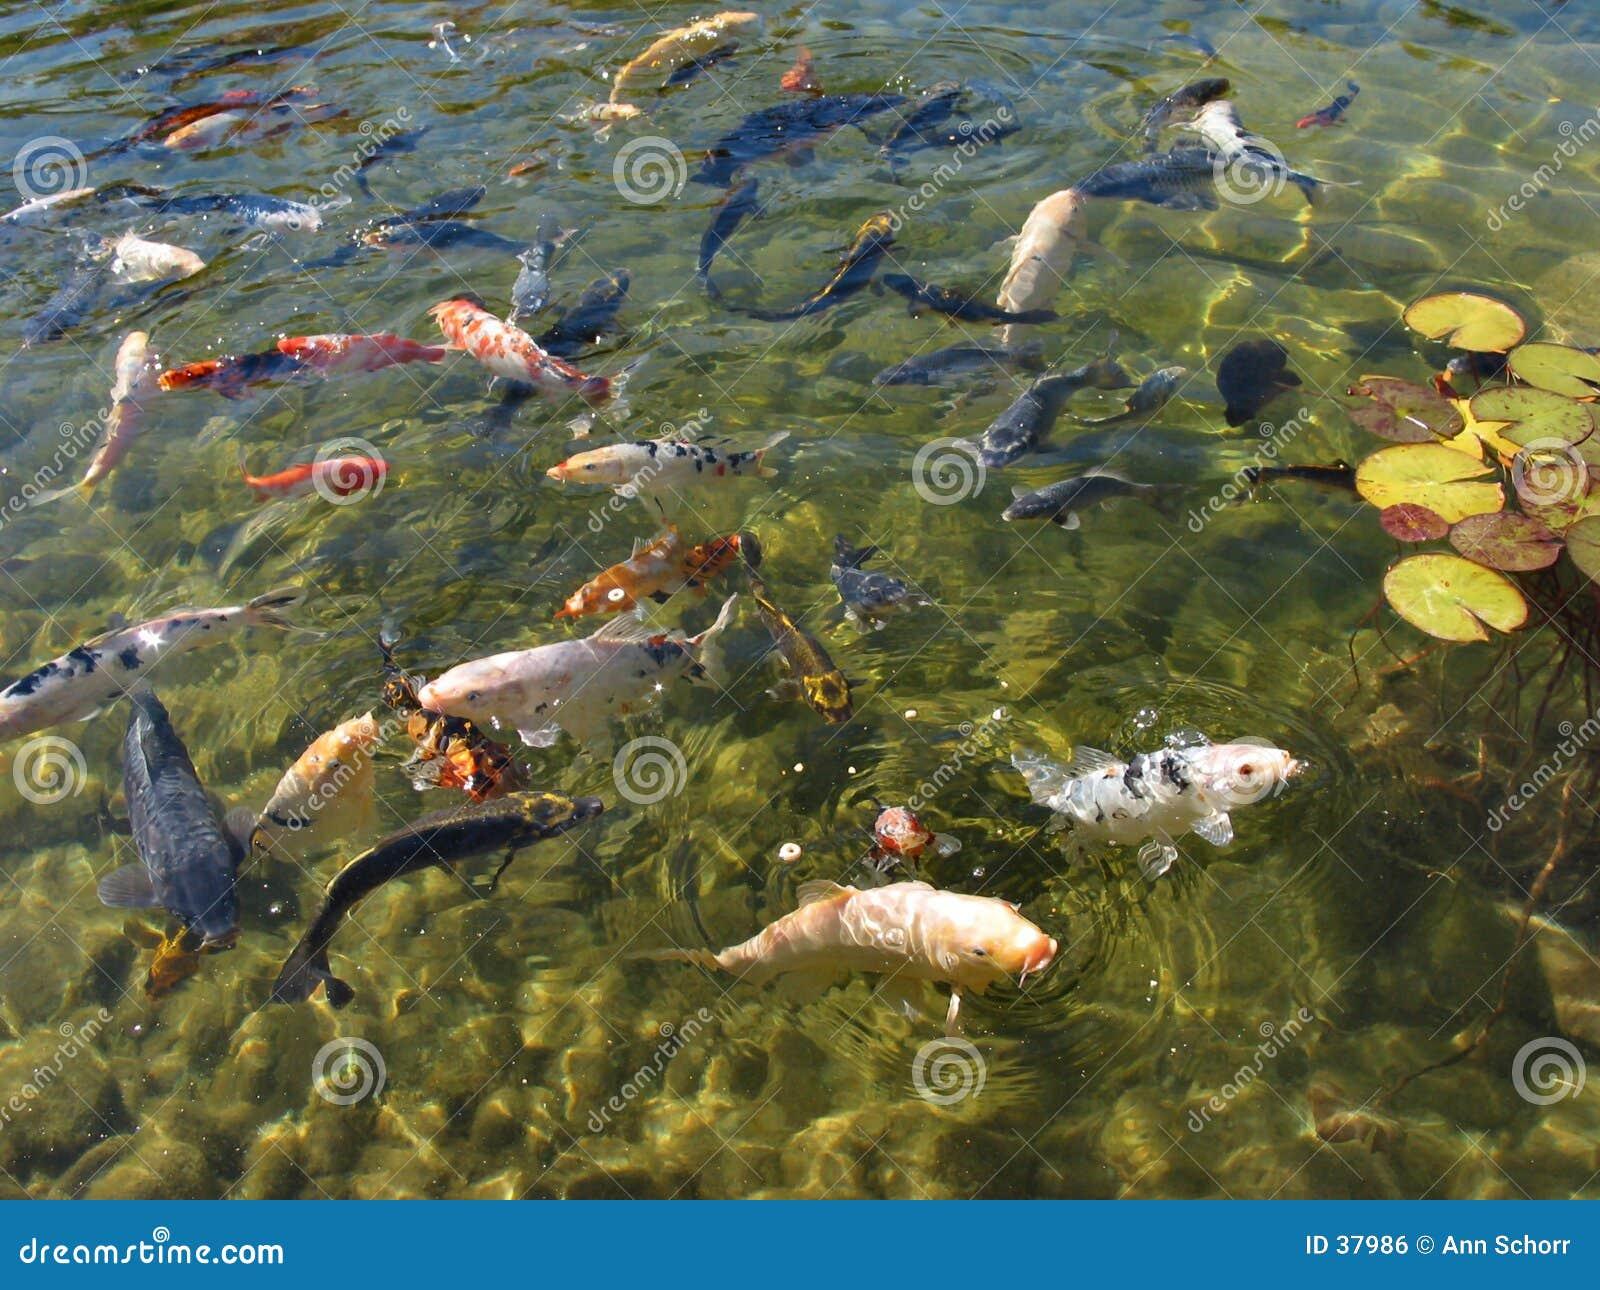 Terughoudende Vissen die Voedsel zoeken